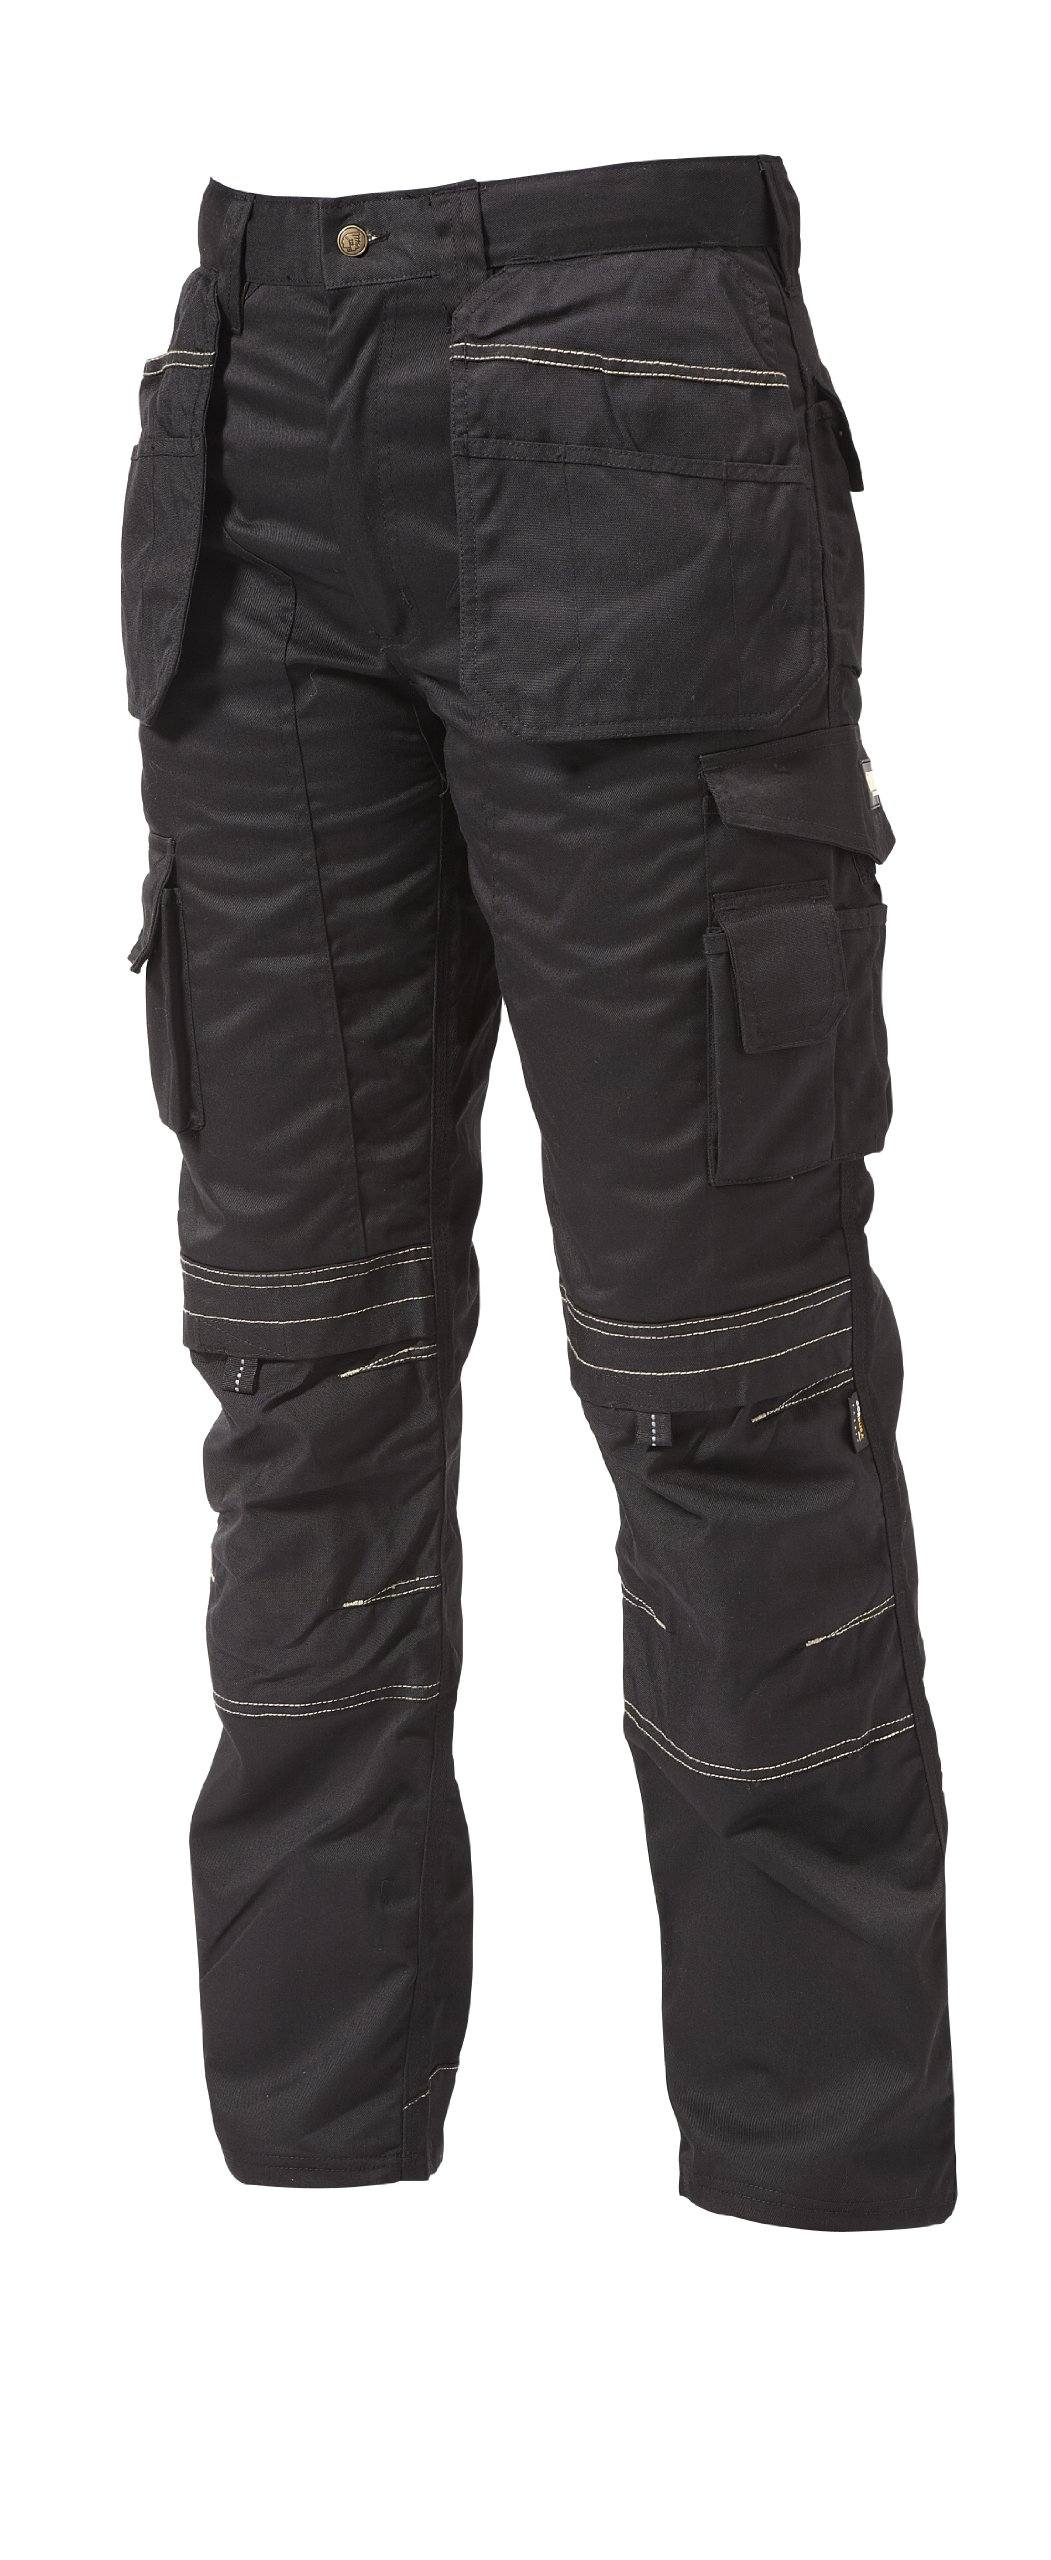 Apache Holster - Pistolera para hombre, tamaño 32 de cintura - 29 de pierna